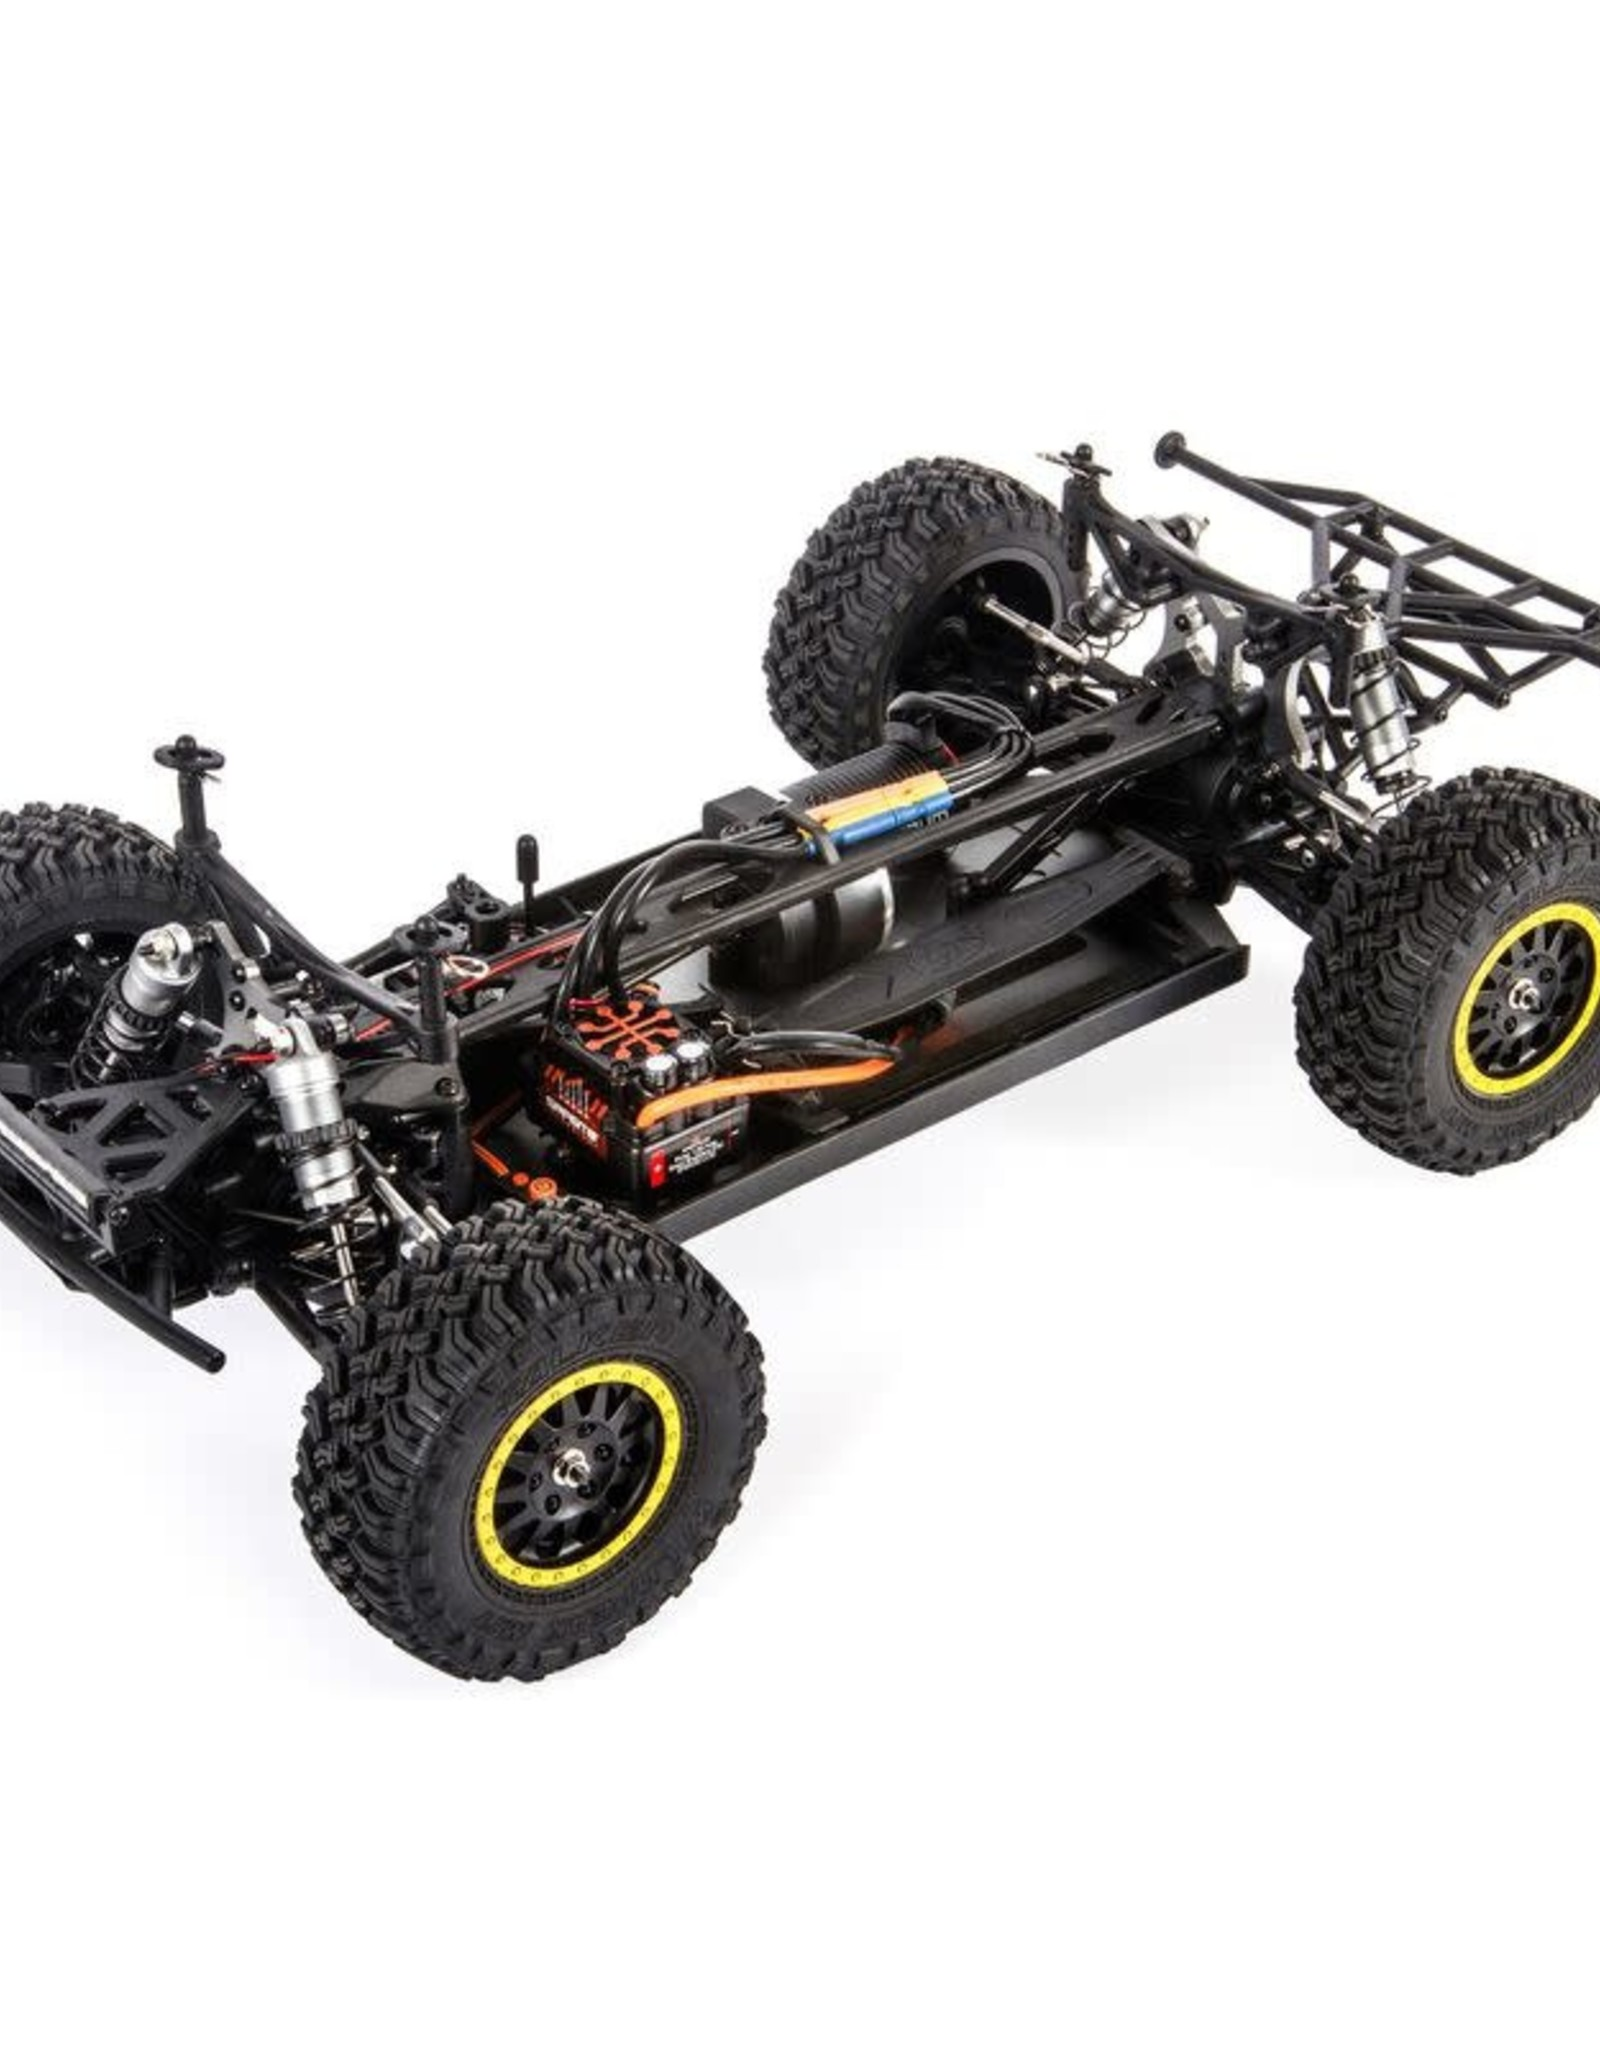 Losi LOS03019T2 1/10 TENACITY TT Pro 4WD SCT Brushless RTR with Smart, Falken